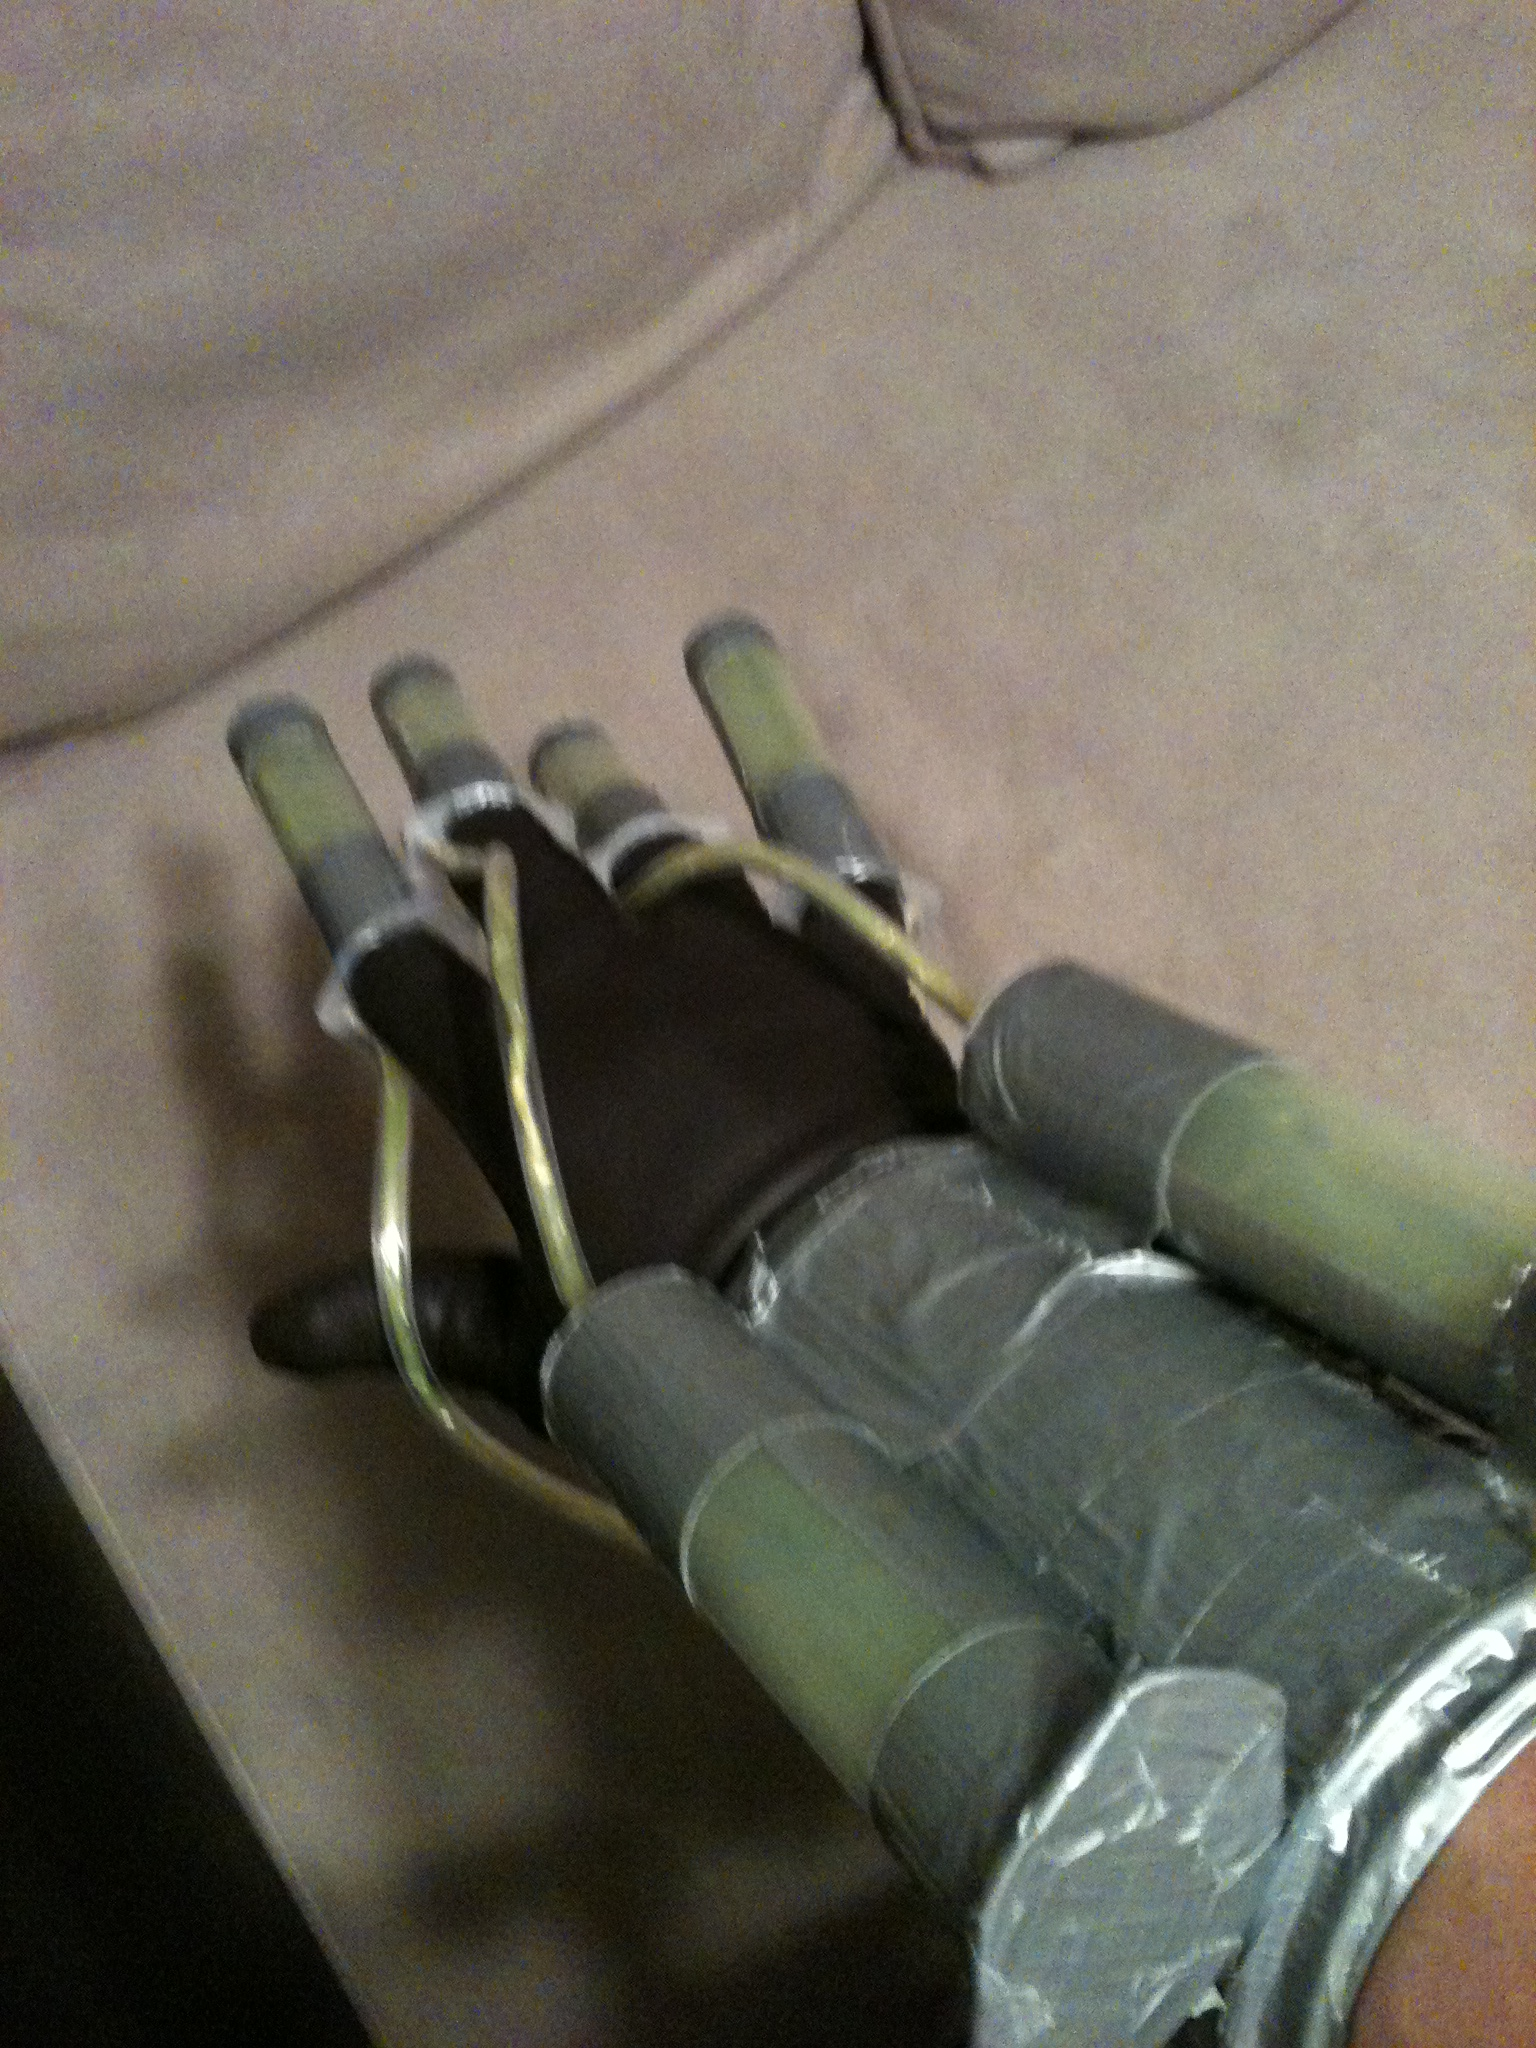 Batman: Arkham Asylum Scarecrow Fear Toxin Syringe Hand